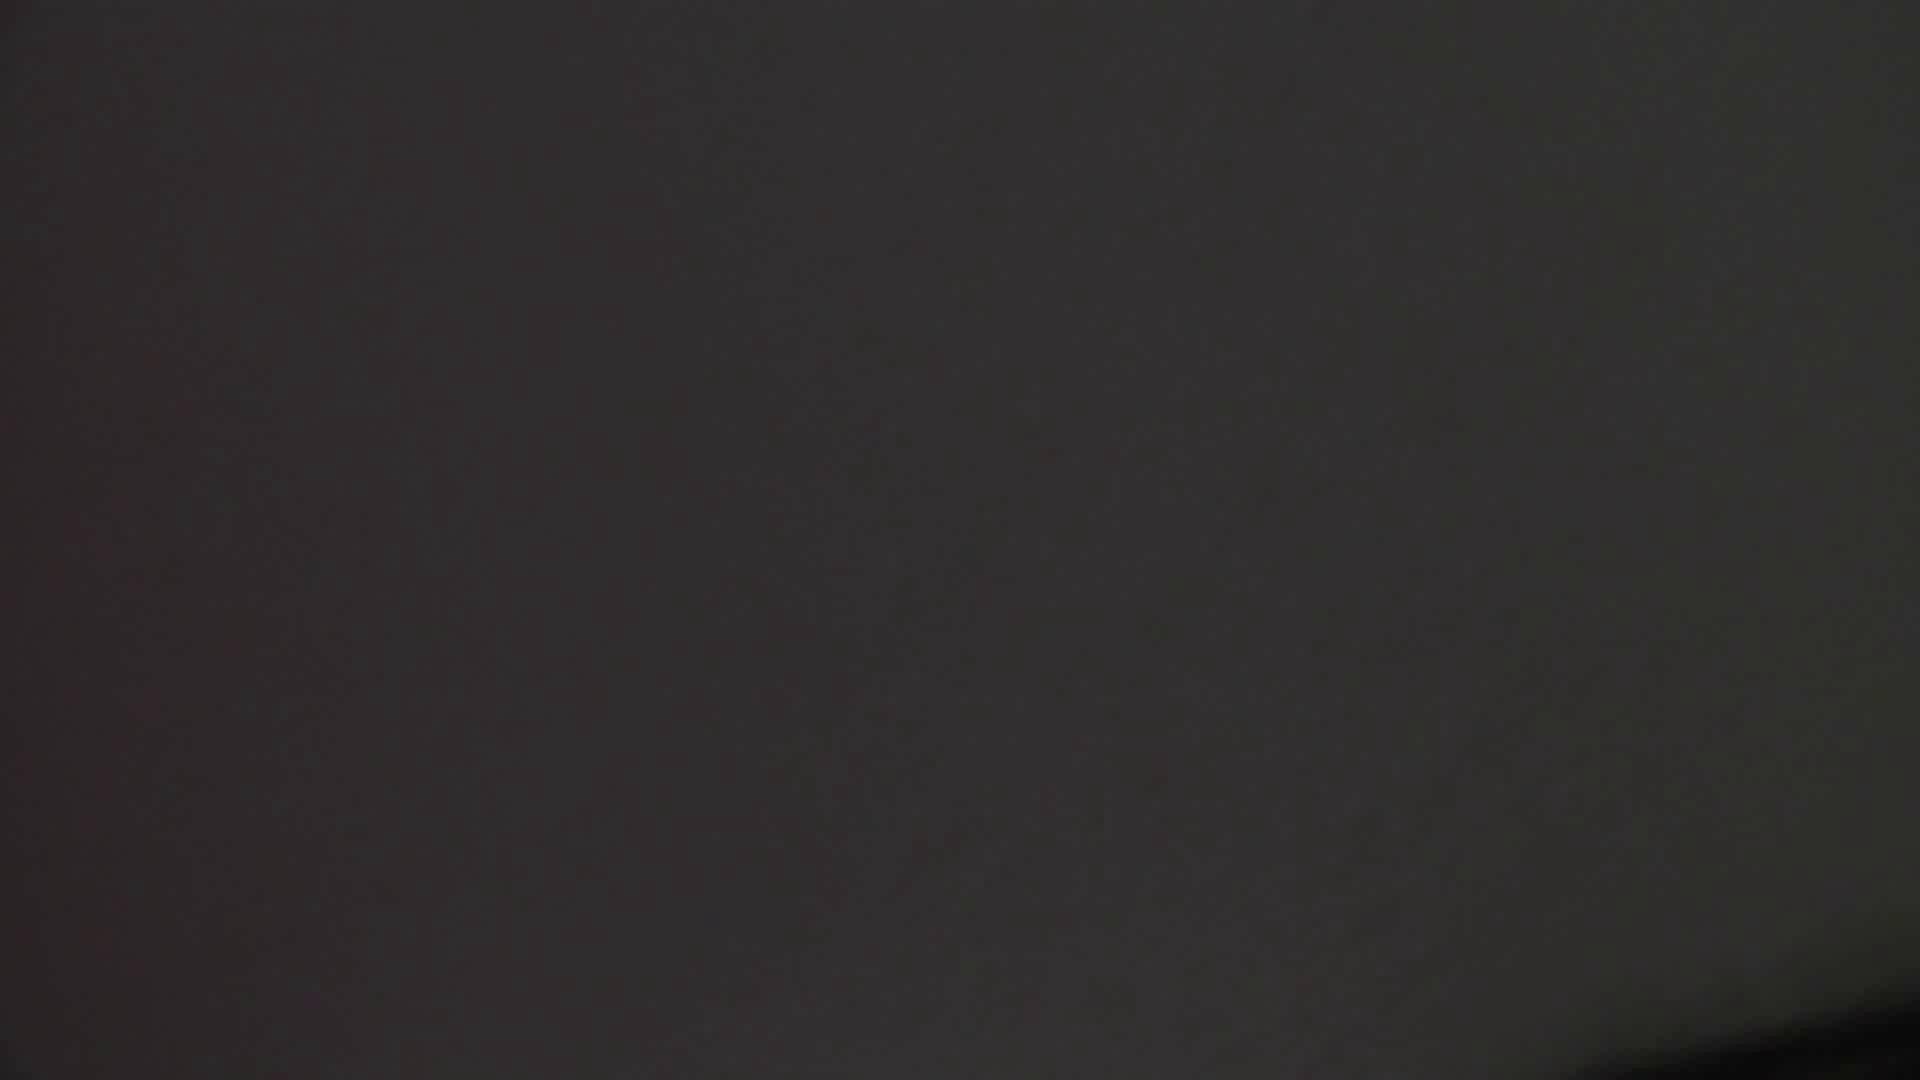 vol.23 命がけ潜伏洗面所! 観察編前代未聞の接近、業界初 洗面所 | OLエロ画像  96PICs 59